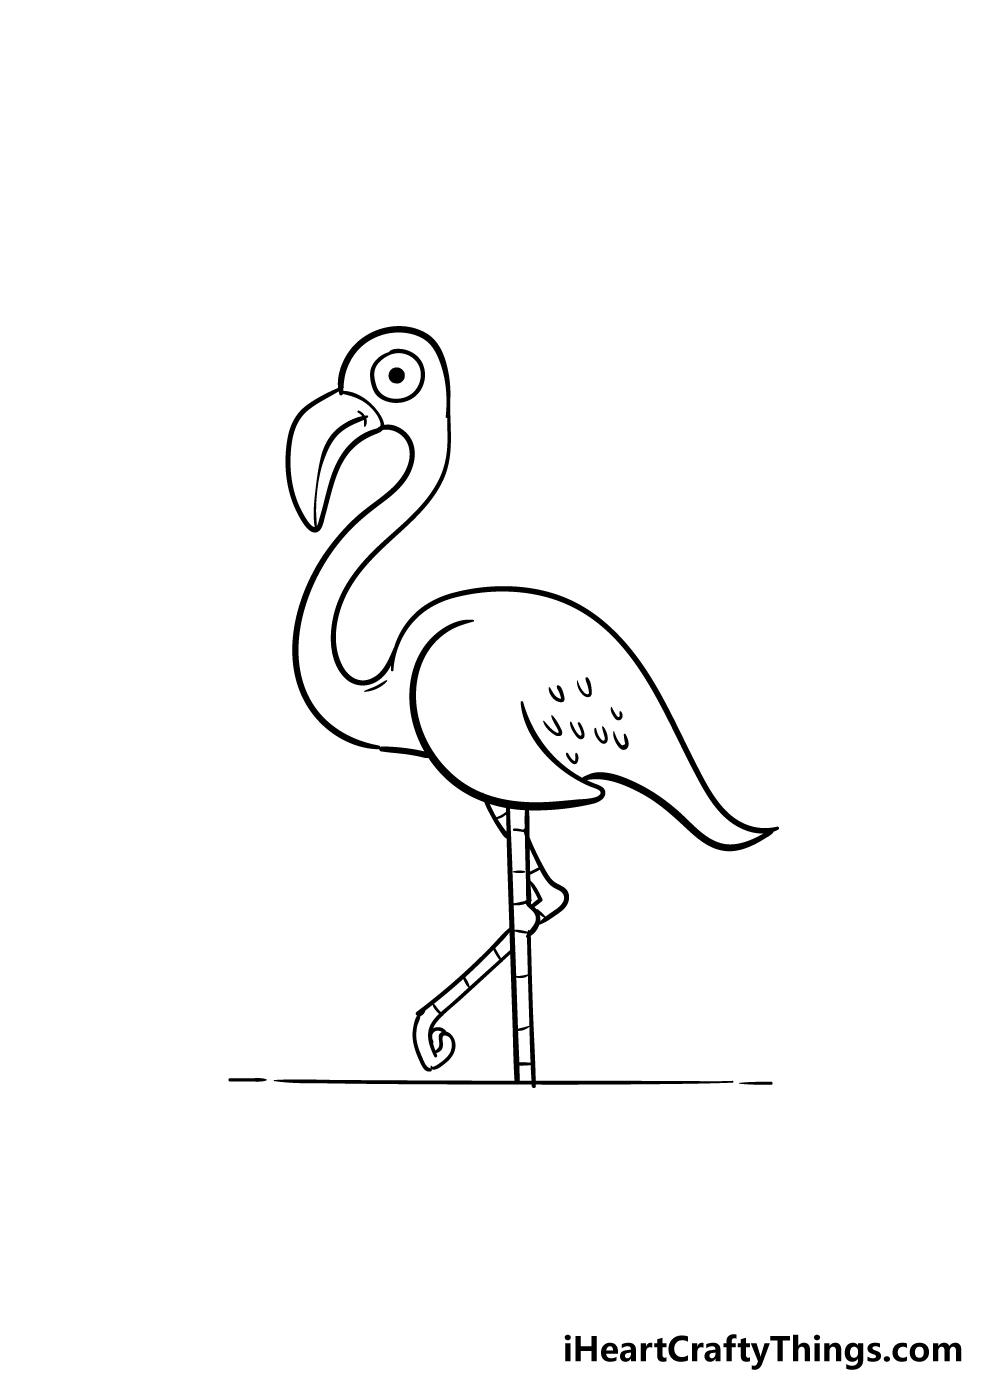 flamingo drawing step 8